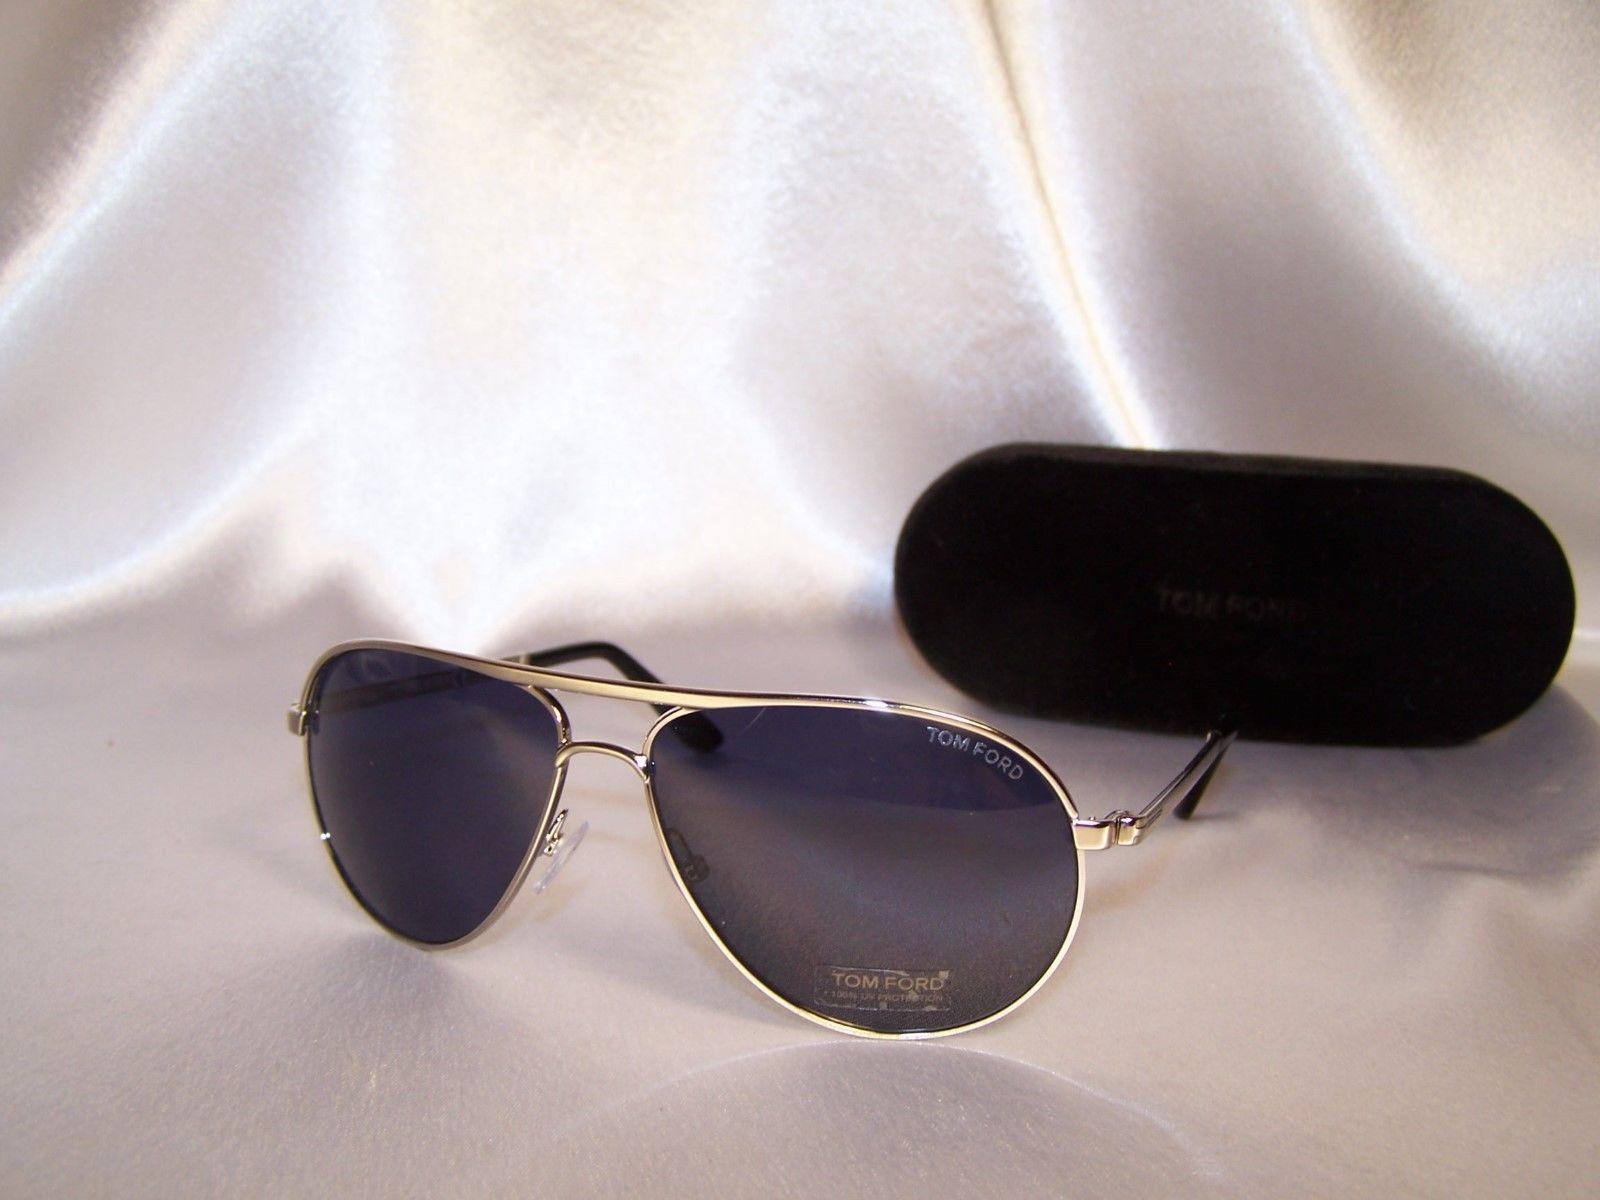 Tom Ford Marko TF0144-18V  Silver / Blue Sunglasses James Bond 007 Skyfall https://t.co/8AumxvEGcj https://t.co/DgY2G4iai1